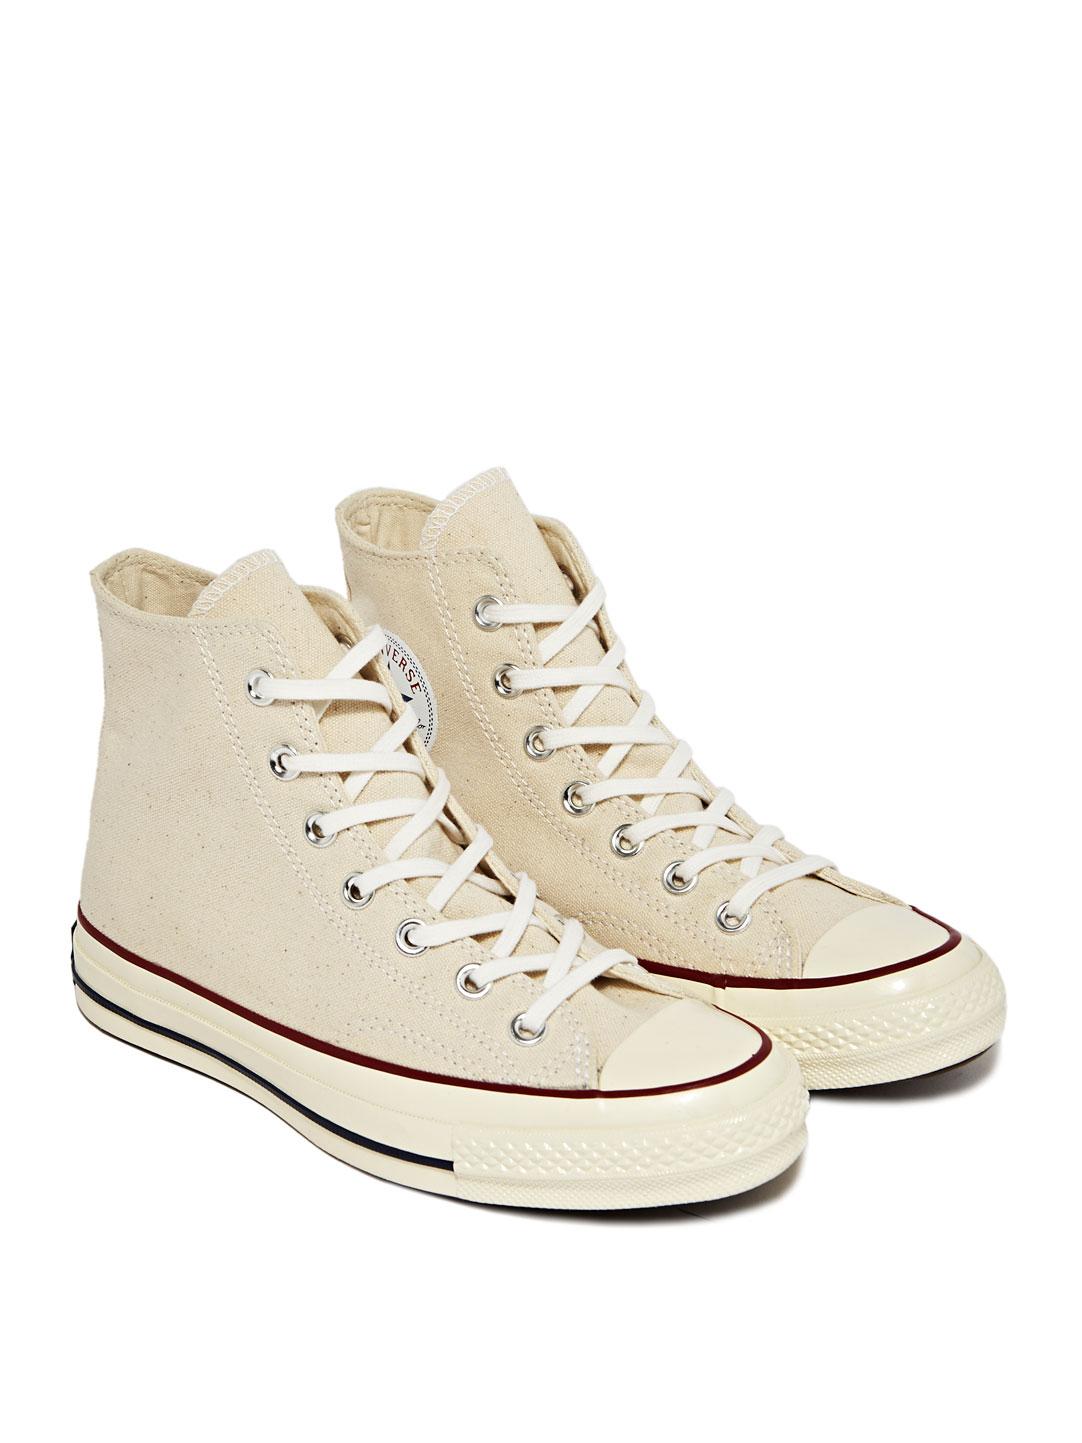 e93d6f7b48e Lyst - Converse 1970S Chuck Taylor All Star Hi Sneakers in Black for Men